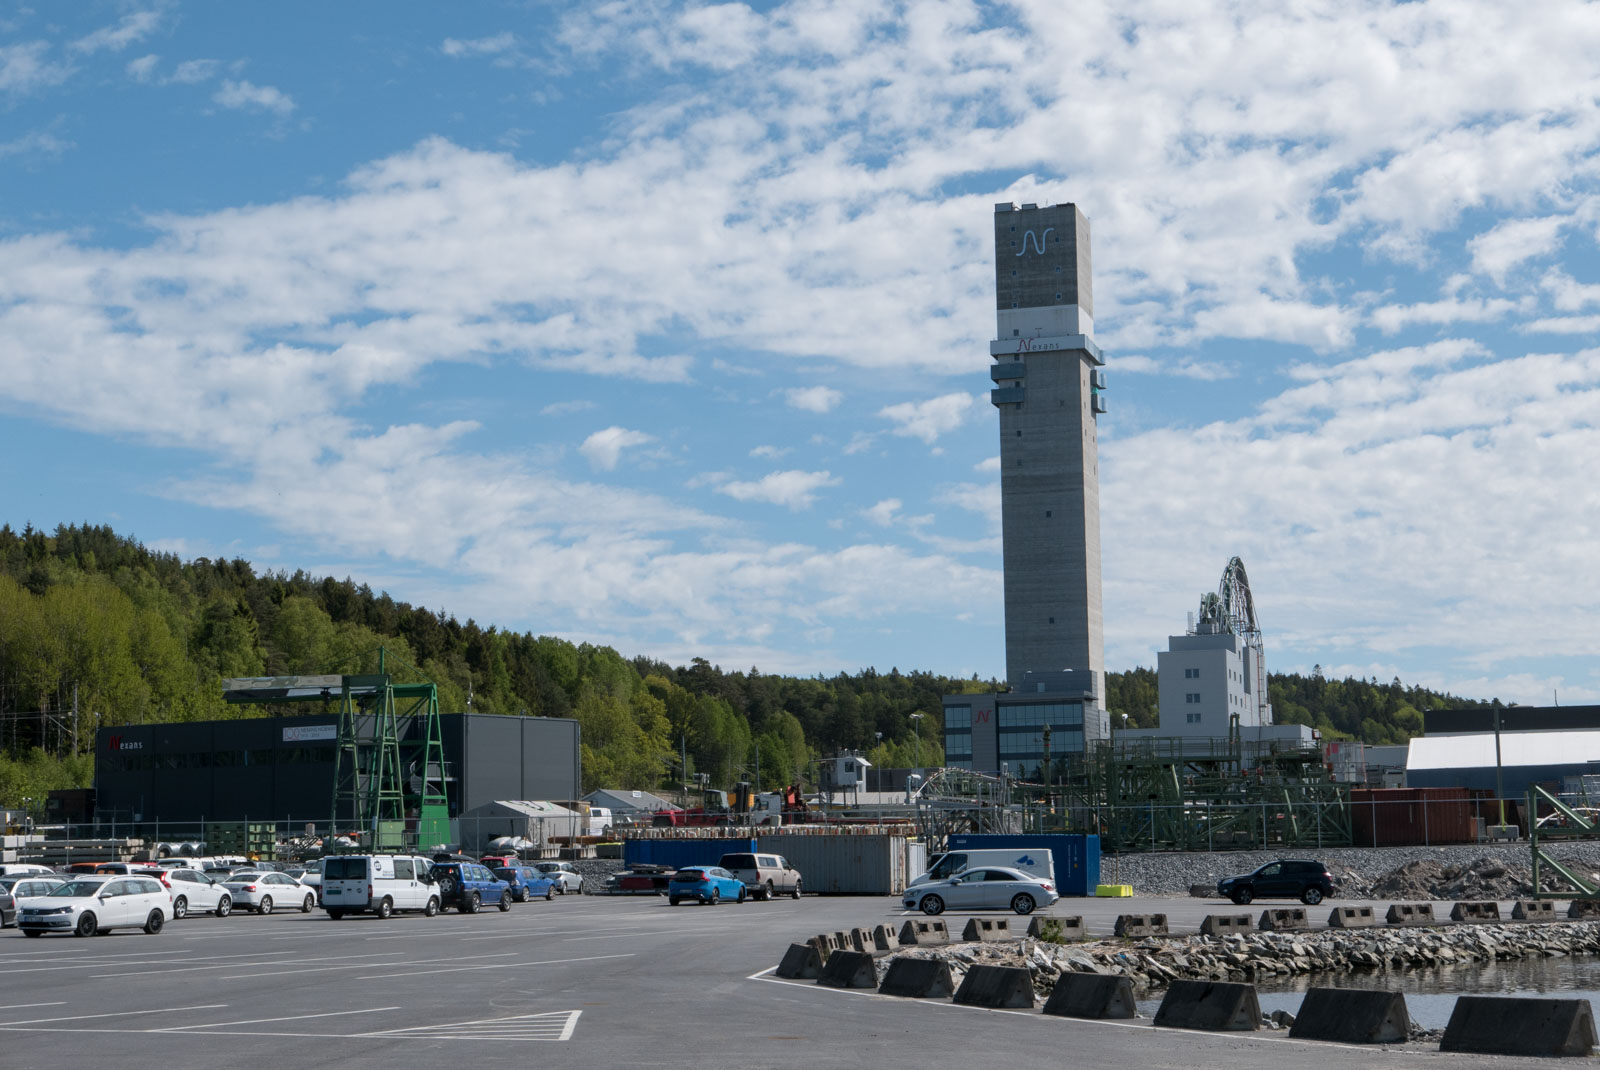 Nexans-tårnet- Norges høyeste bygning med sine 120 meter.